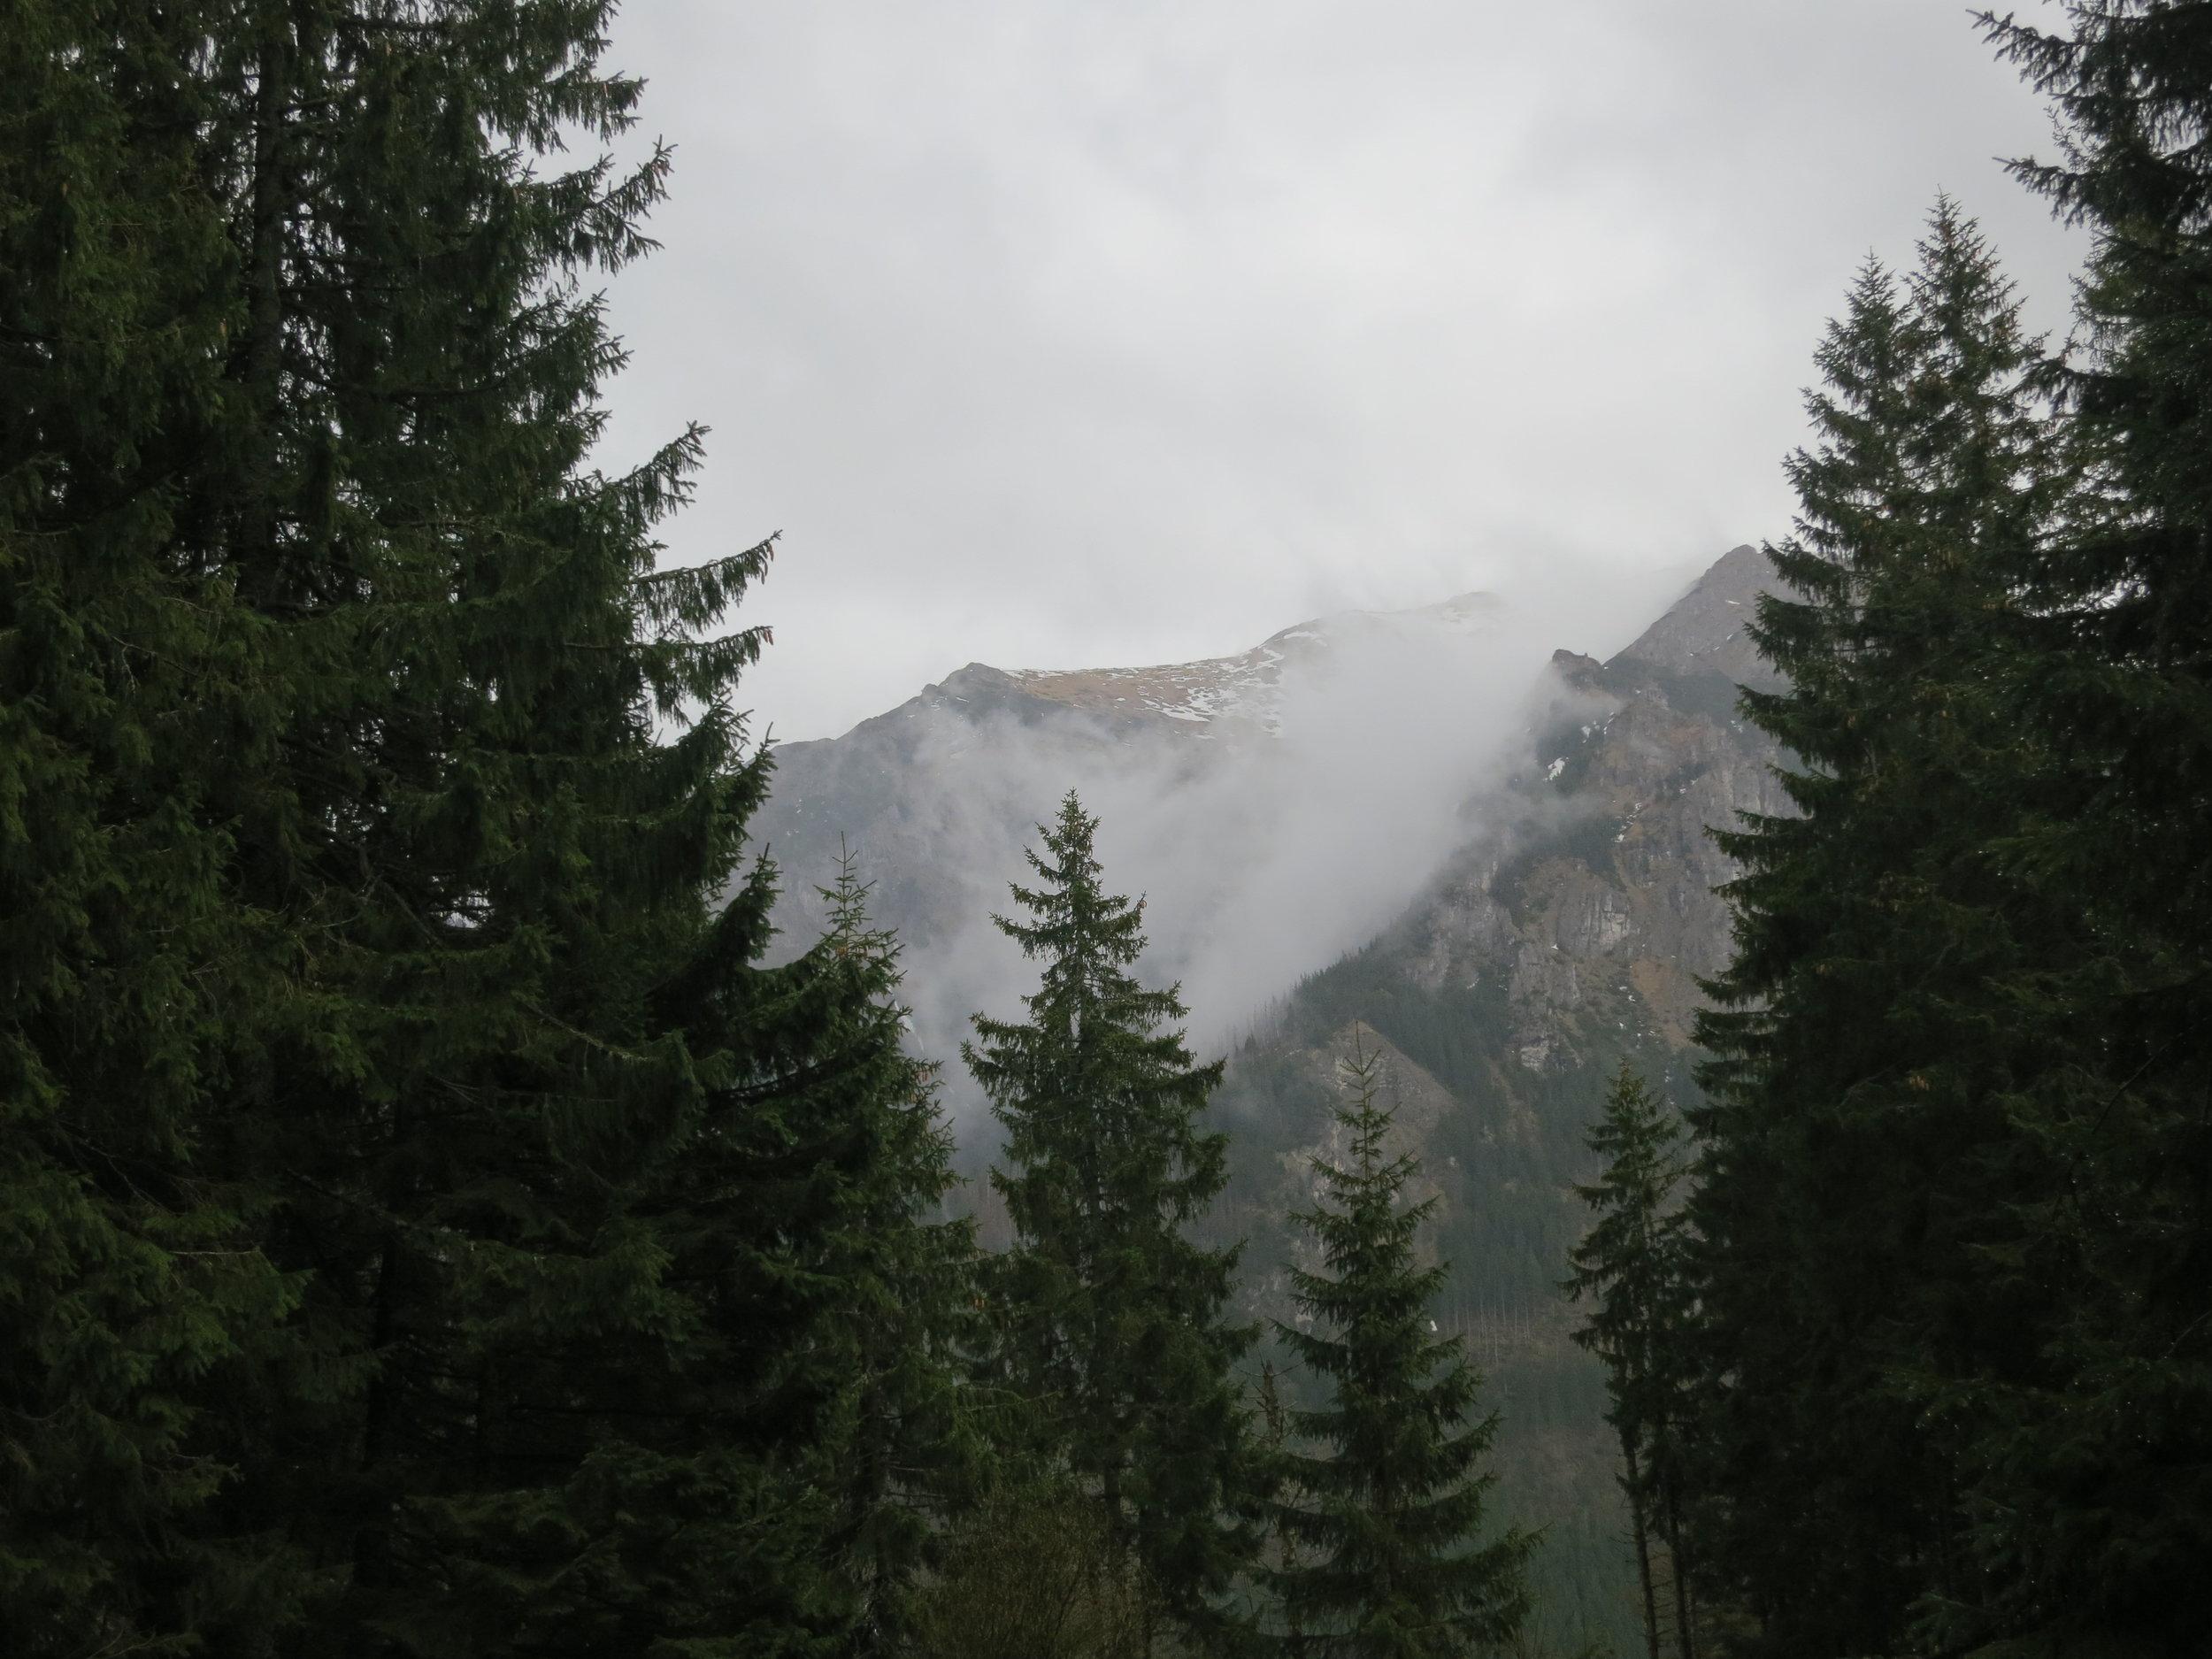 Fog in the Tatra mountains